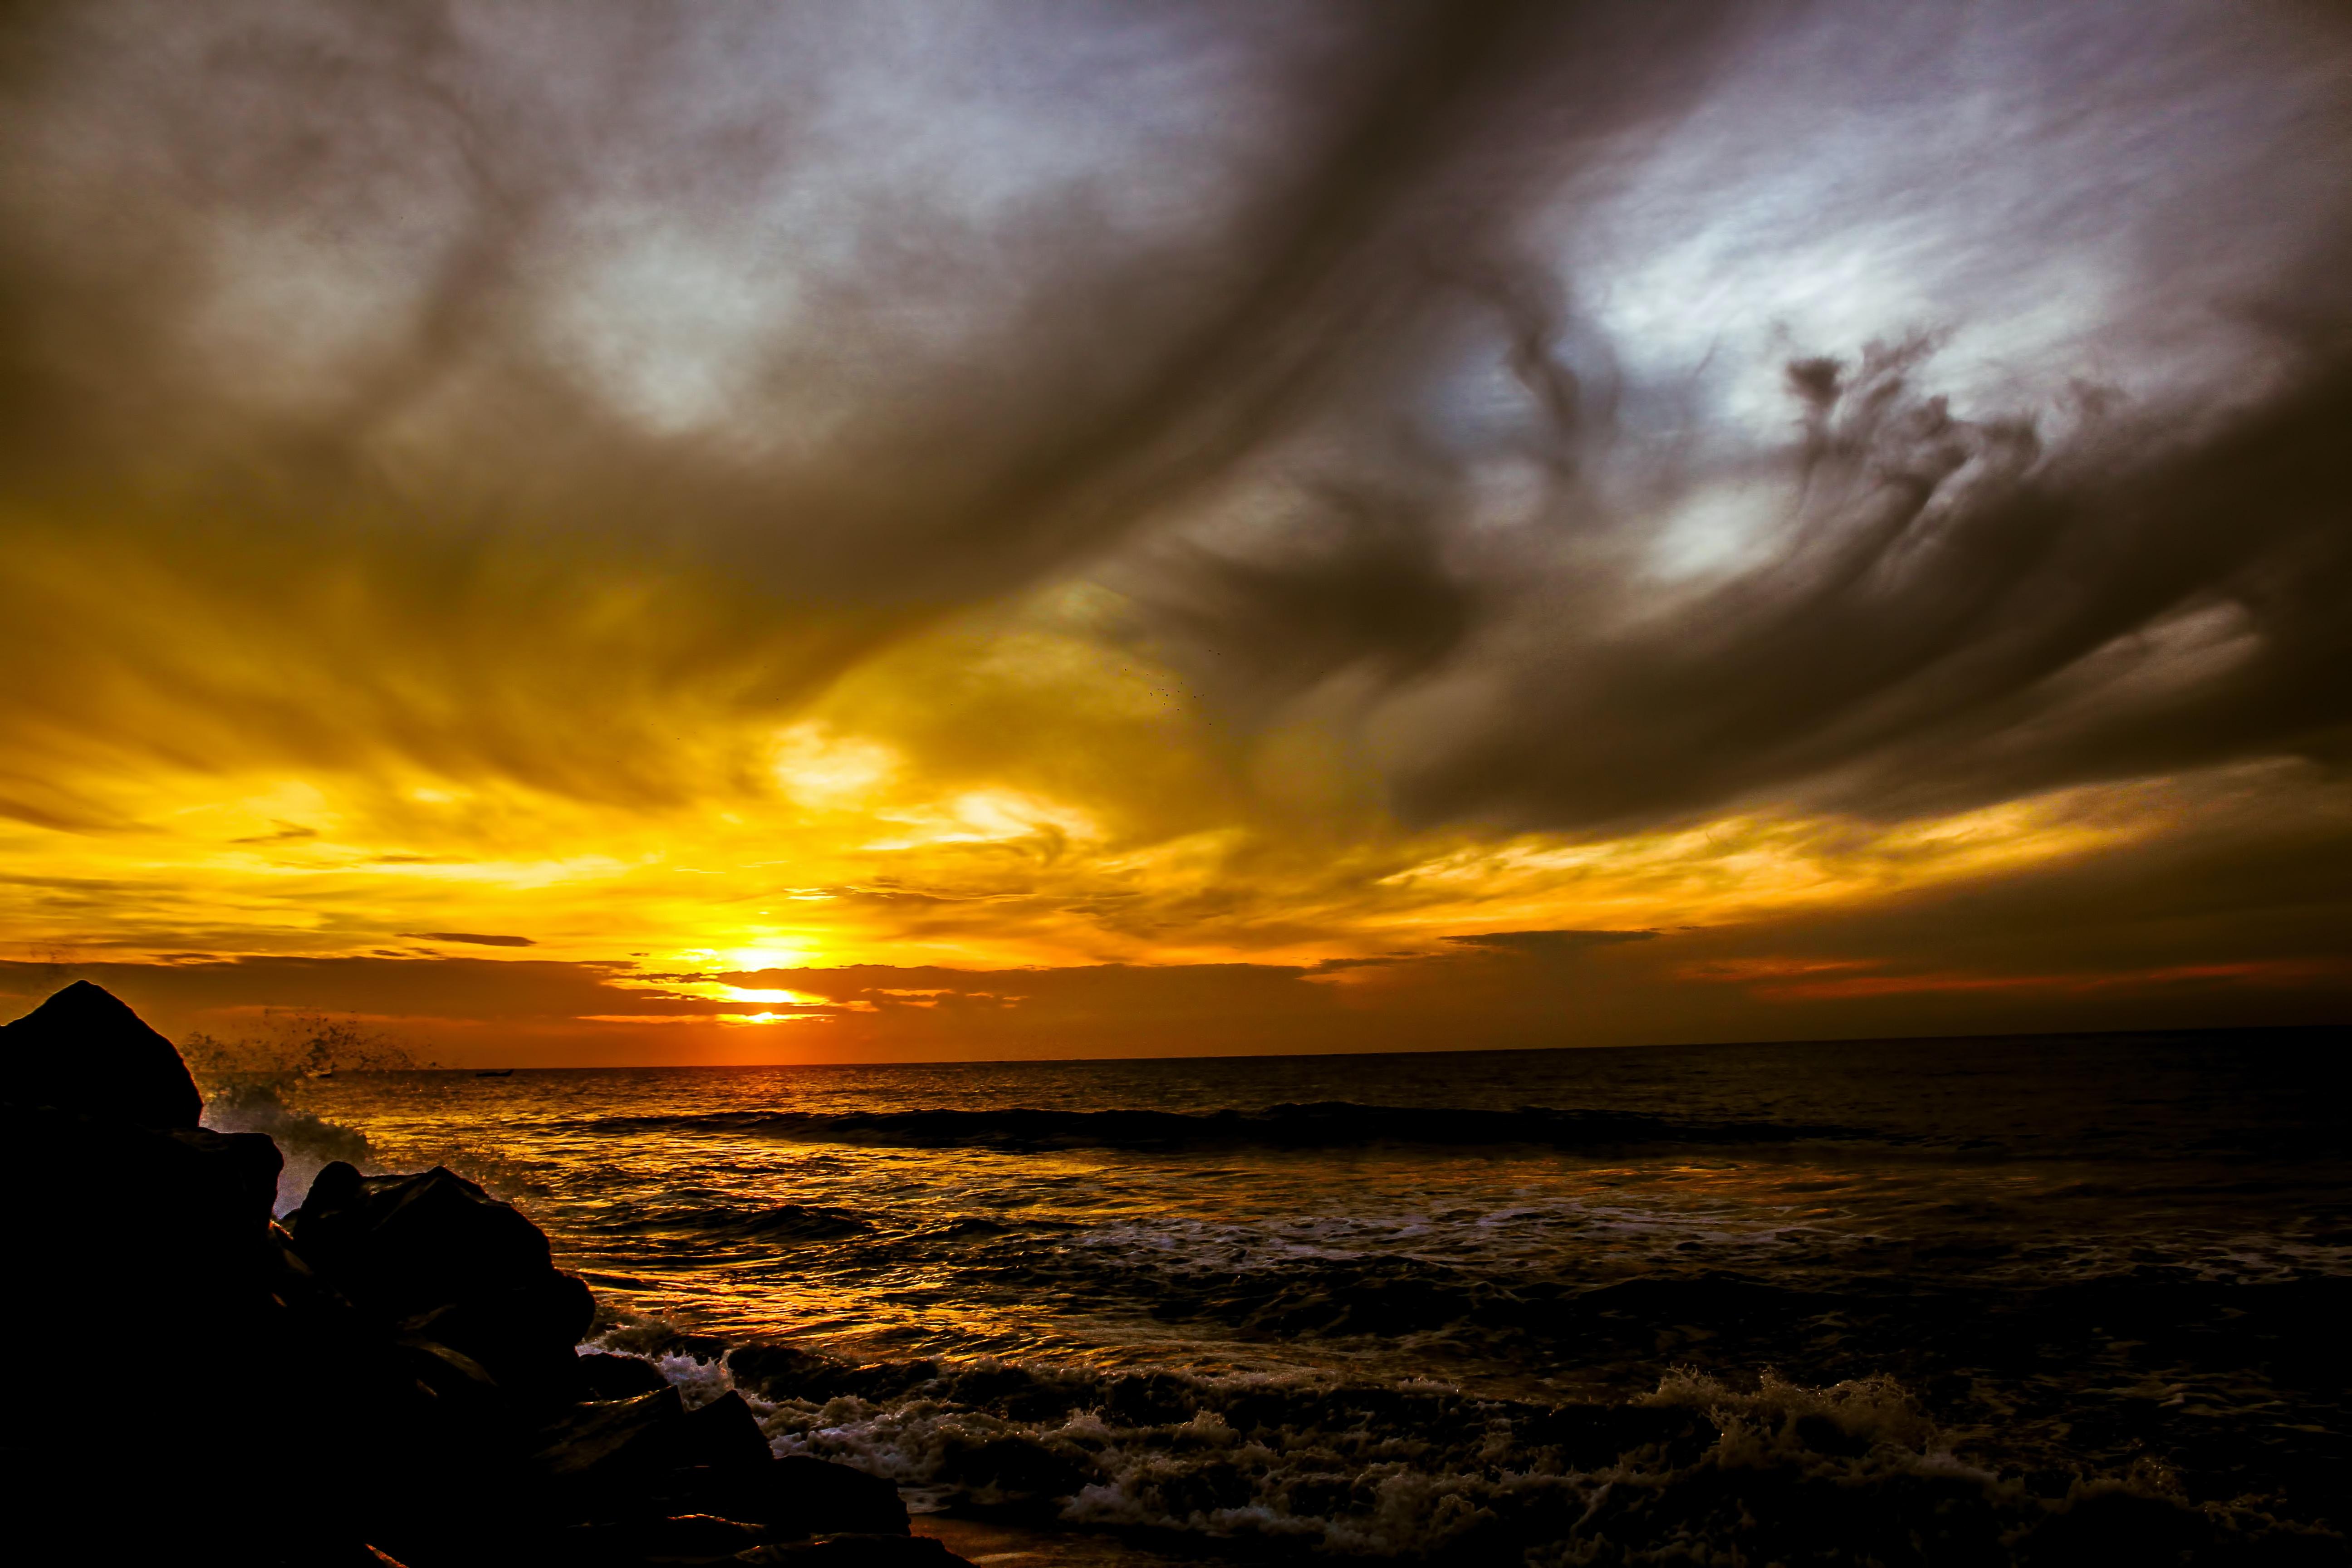 sunset screnety